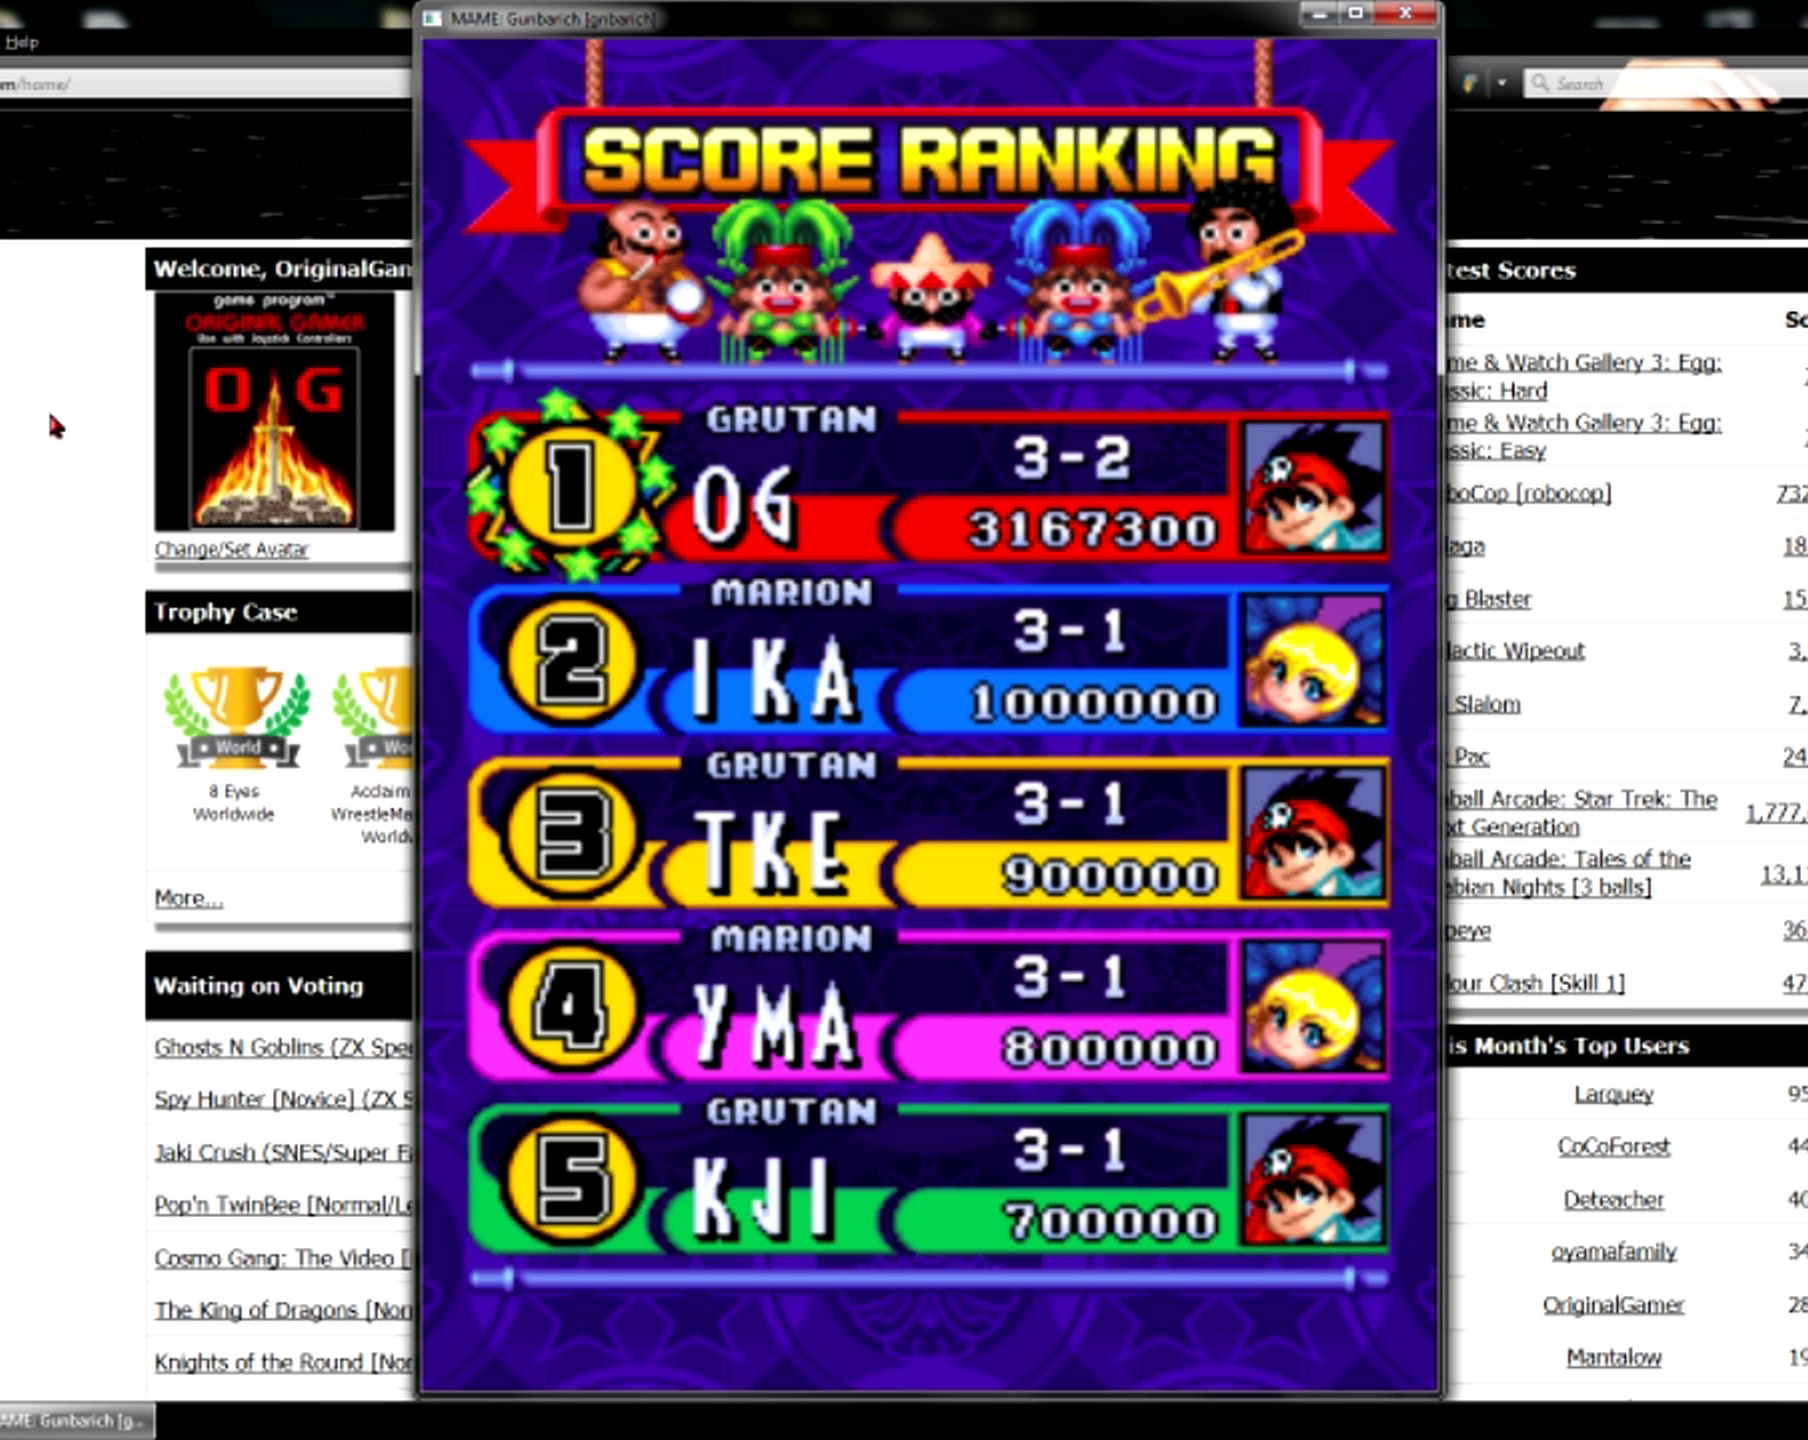 OriginalGamer: Gunbarich [gnbarich] (Arcade Emulated / M.A.M.E.) 3,167,300 points on 2015-05-30 23:40:35